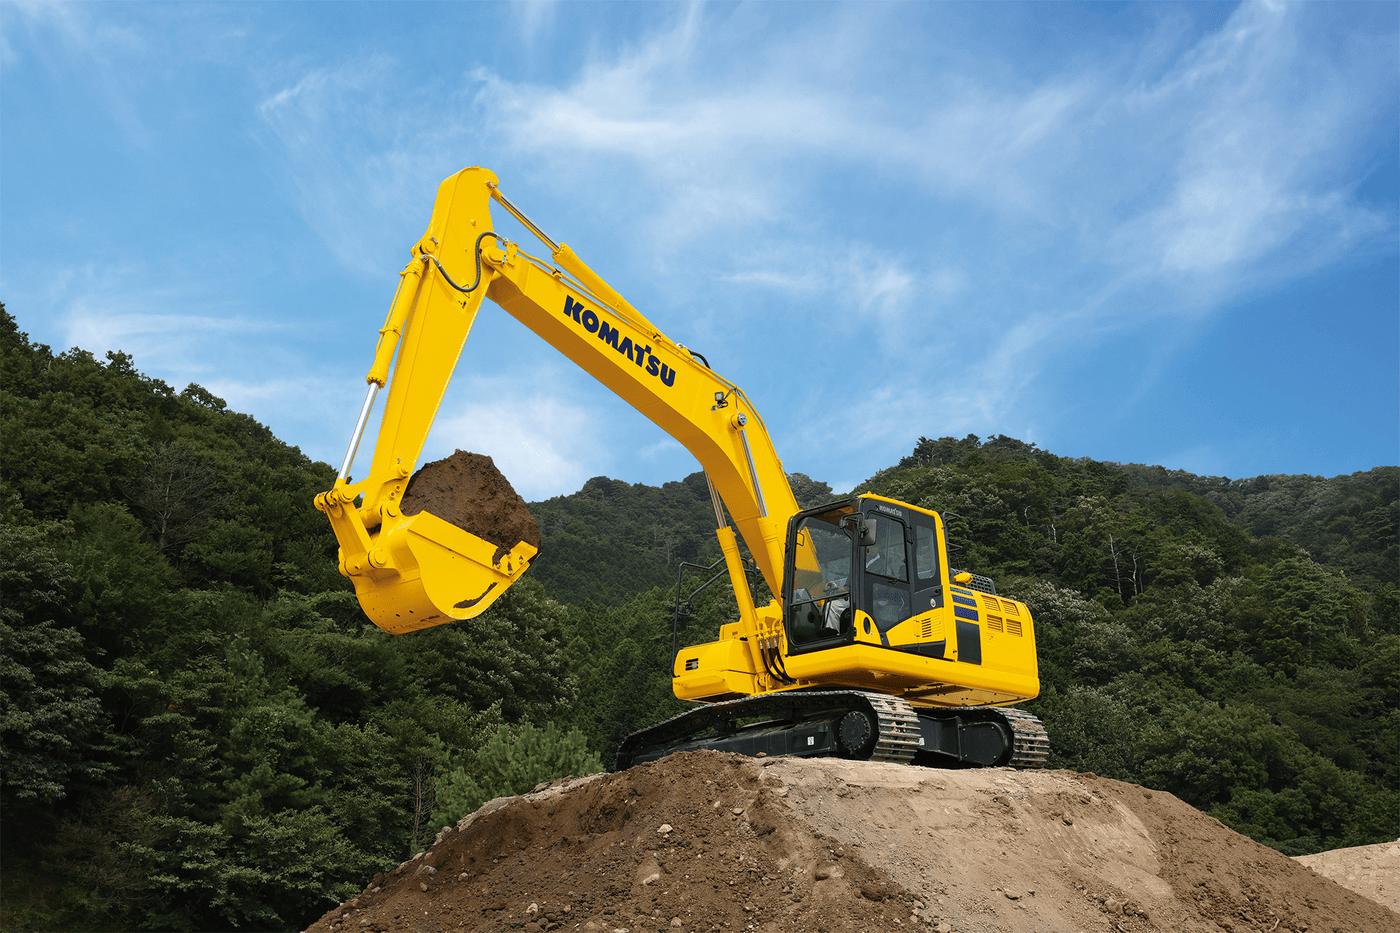 Komatsu Electric Excavator 2 Retouched